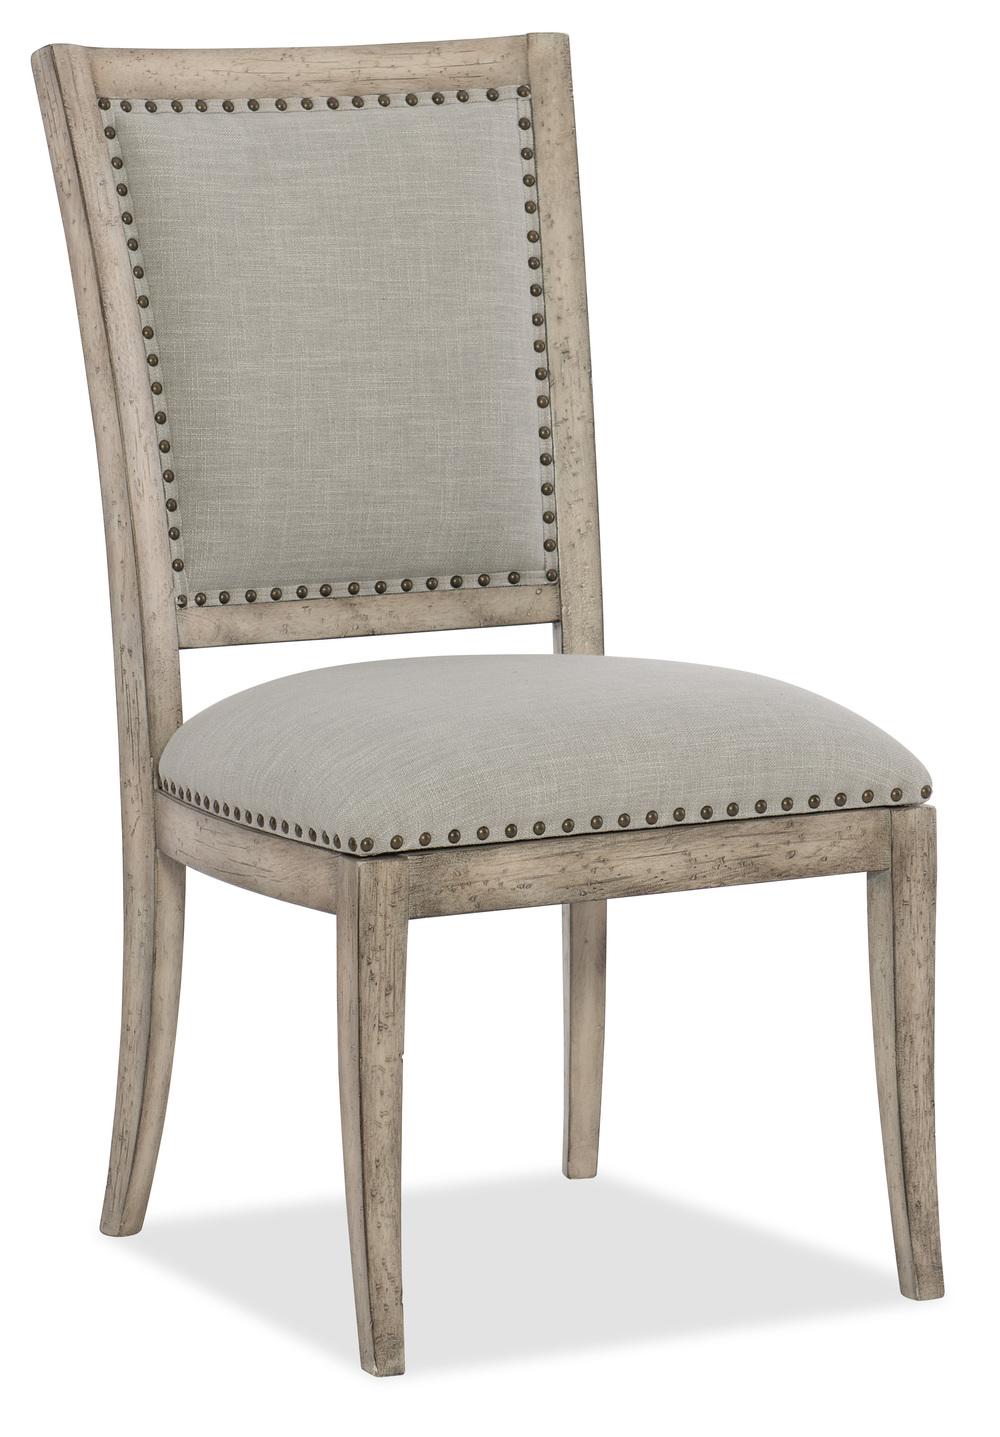 HOOKER FURNITURE CO - Vitton Upholstered Side Chair